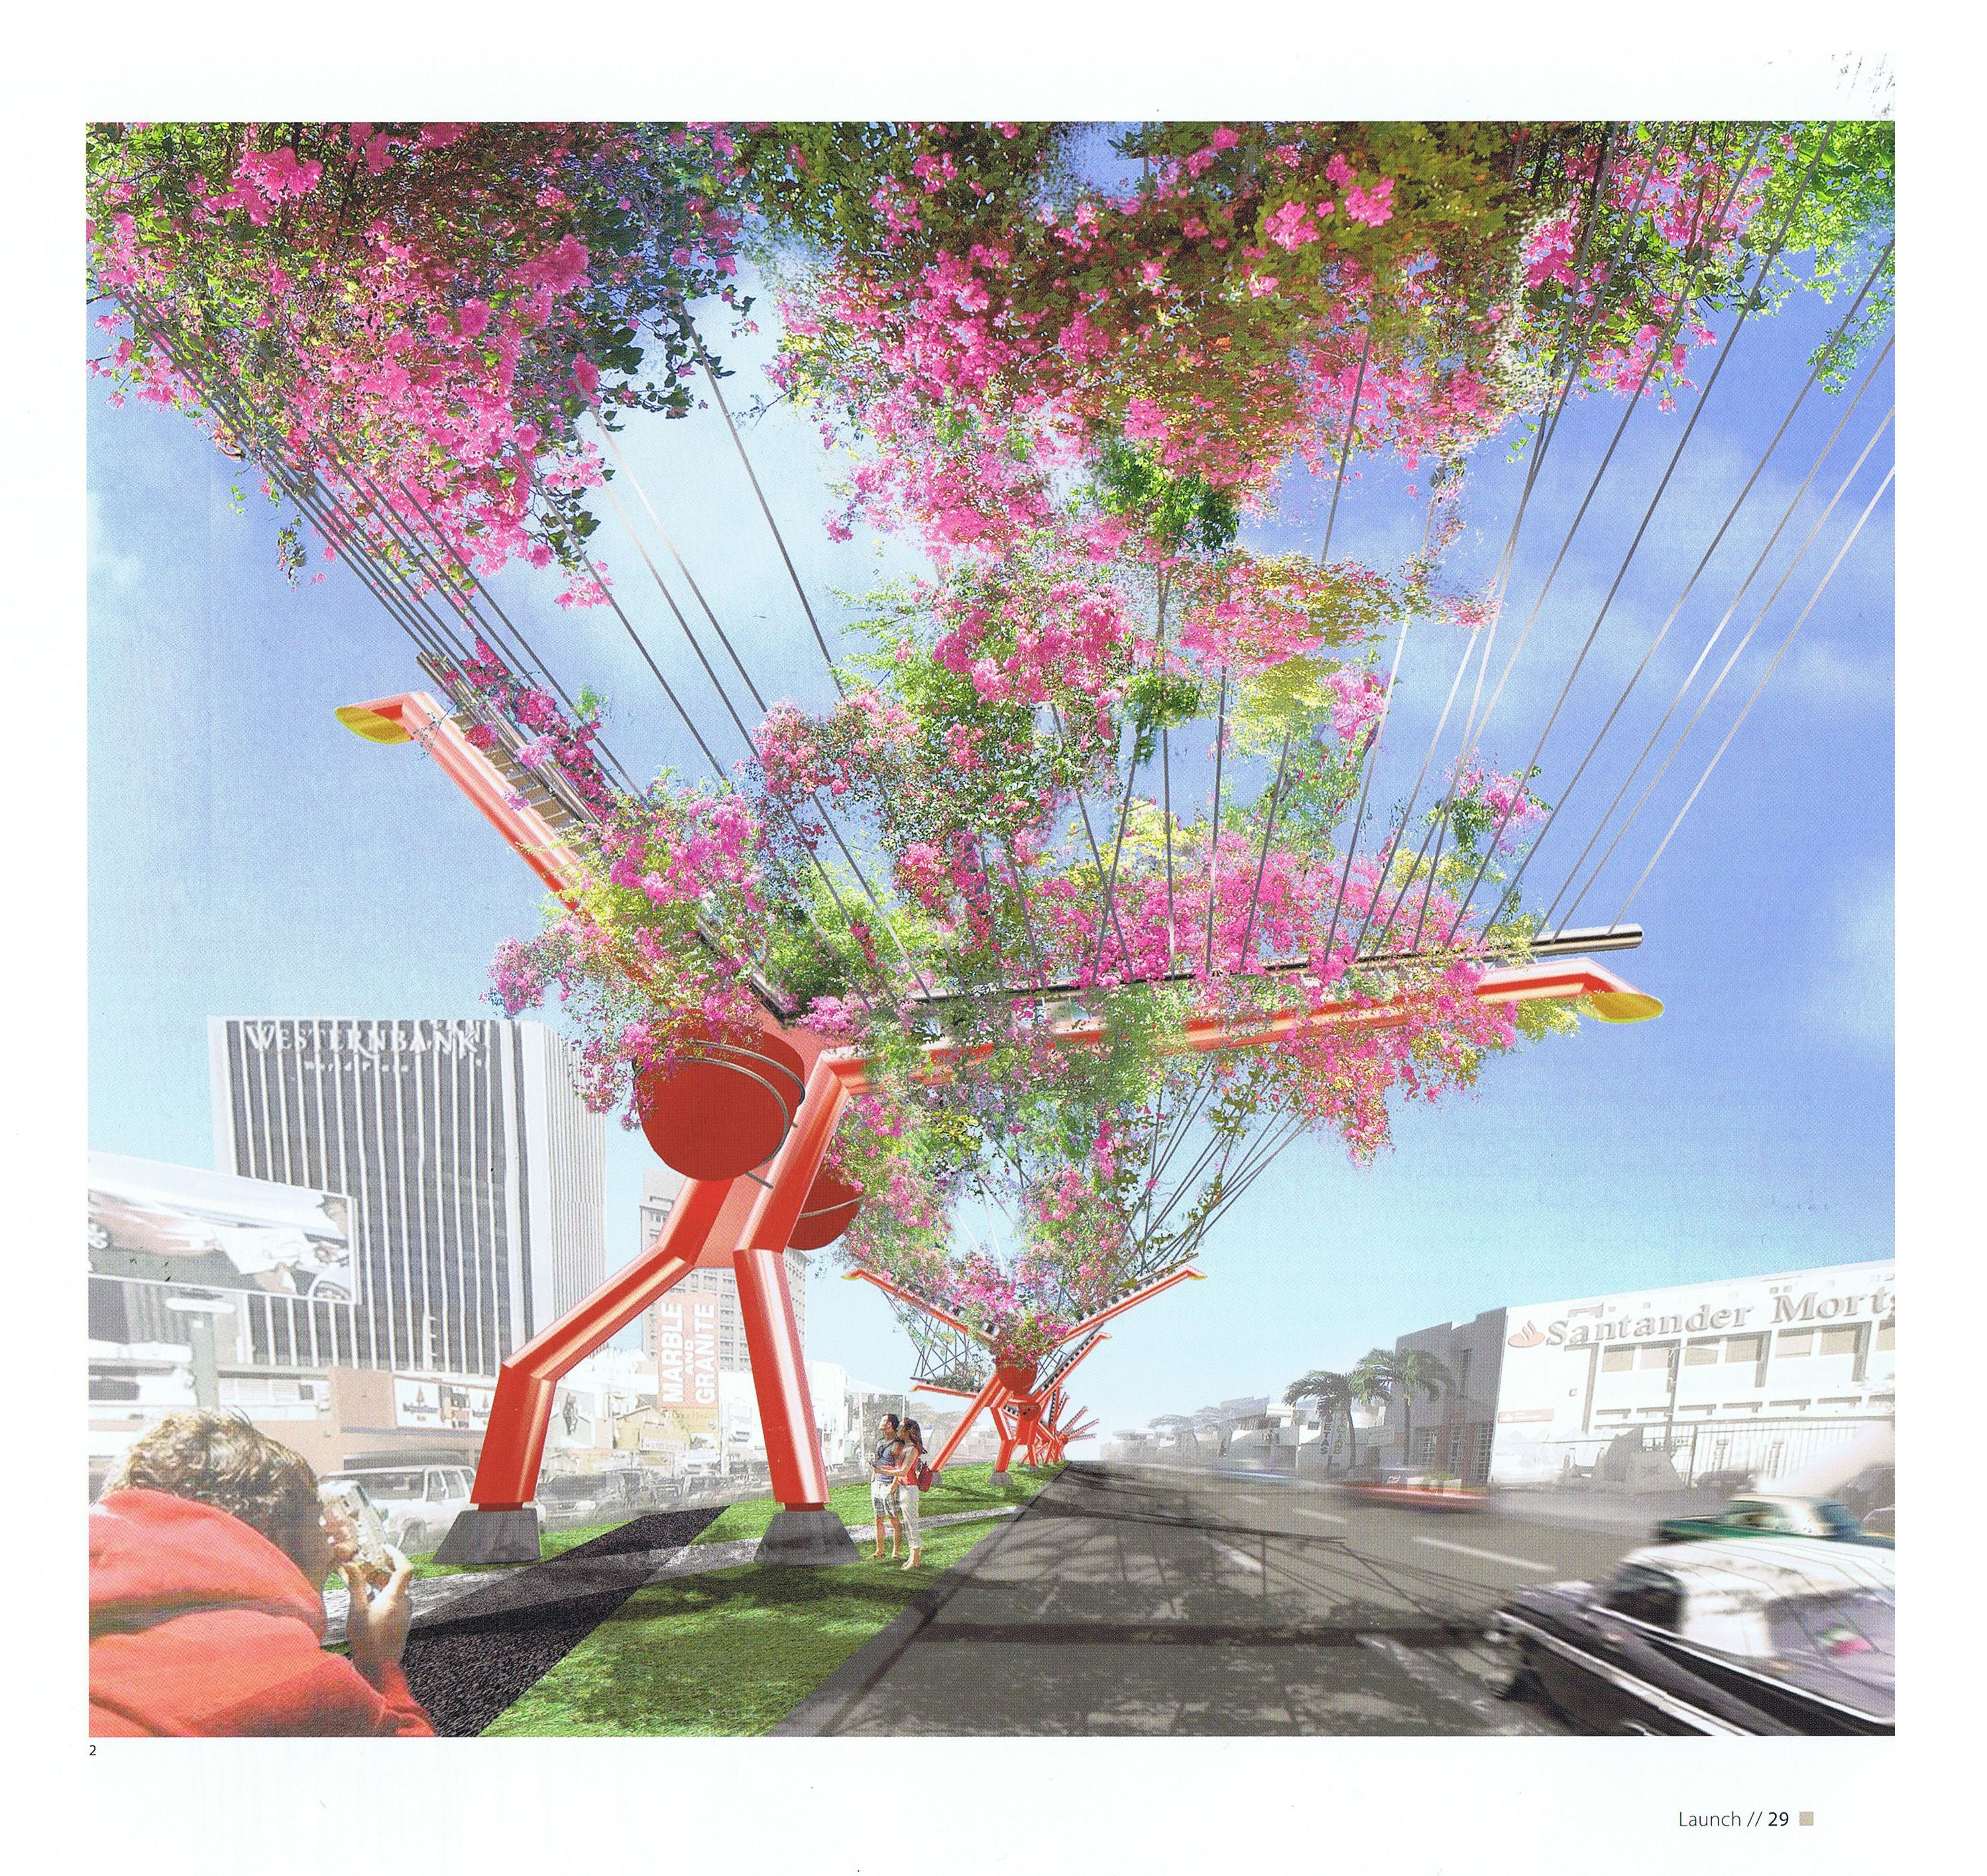 Palio de Bougainvilleas, Avenida Roosevelt, San Juan Puerto Rico  Wind Adapted Road Canopy Structure// West 8